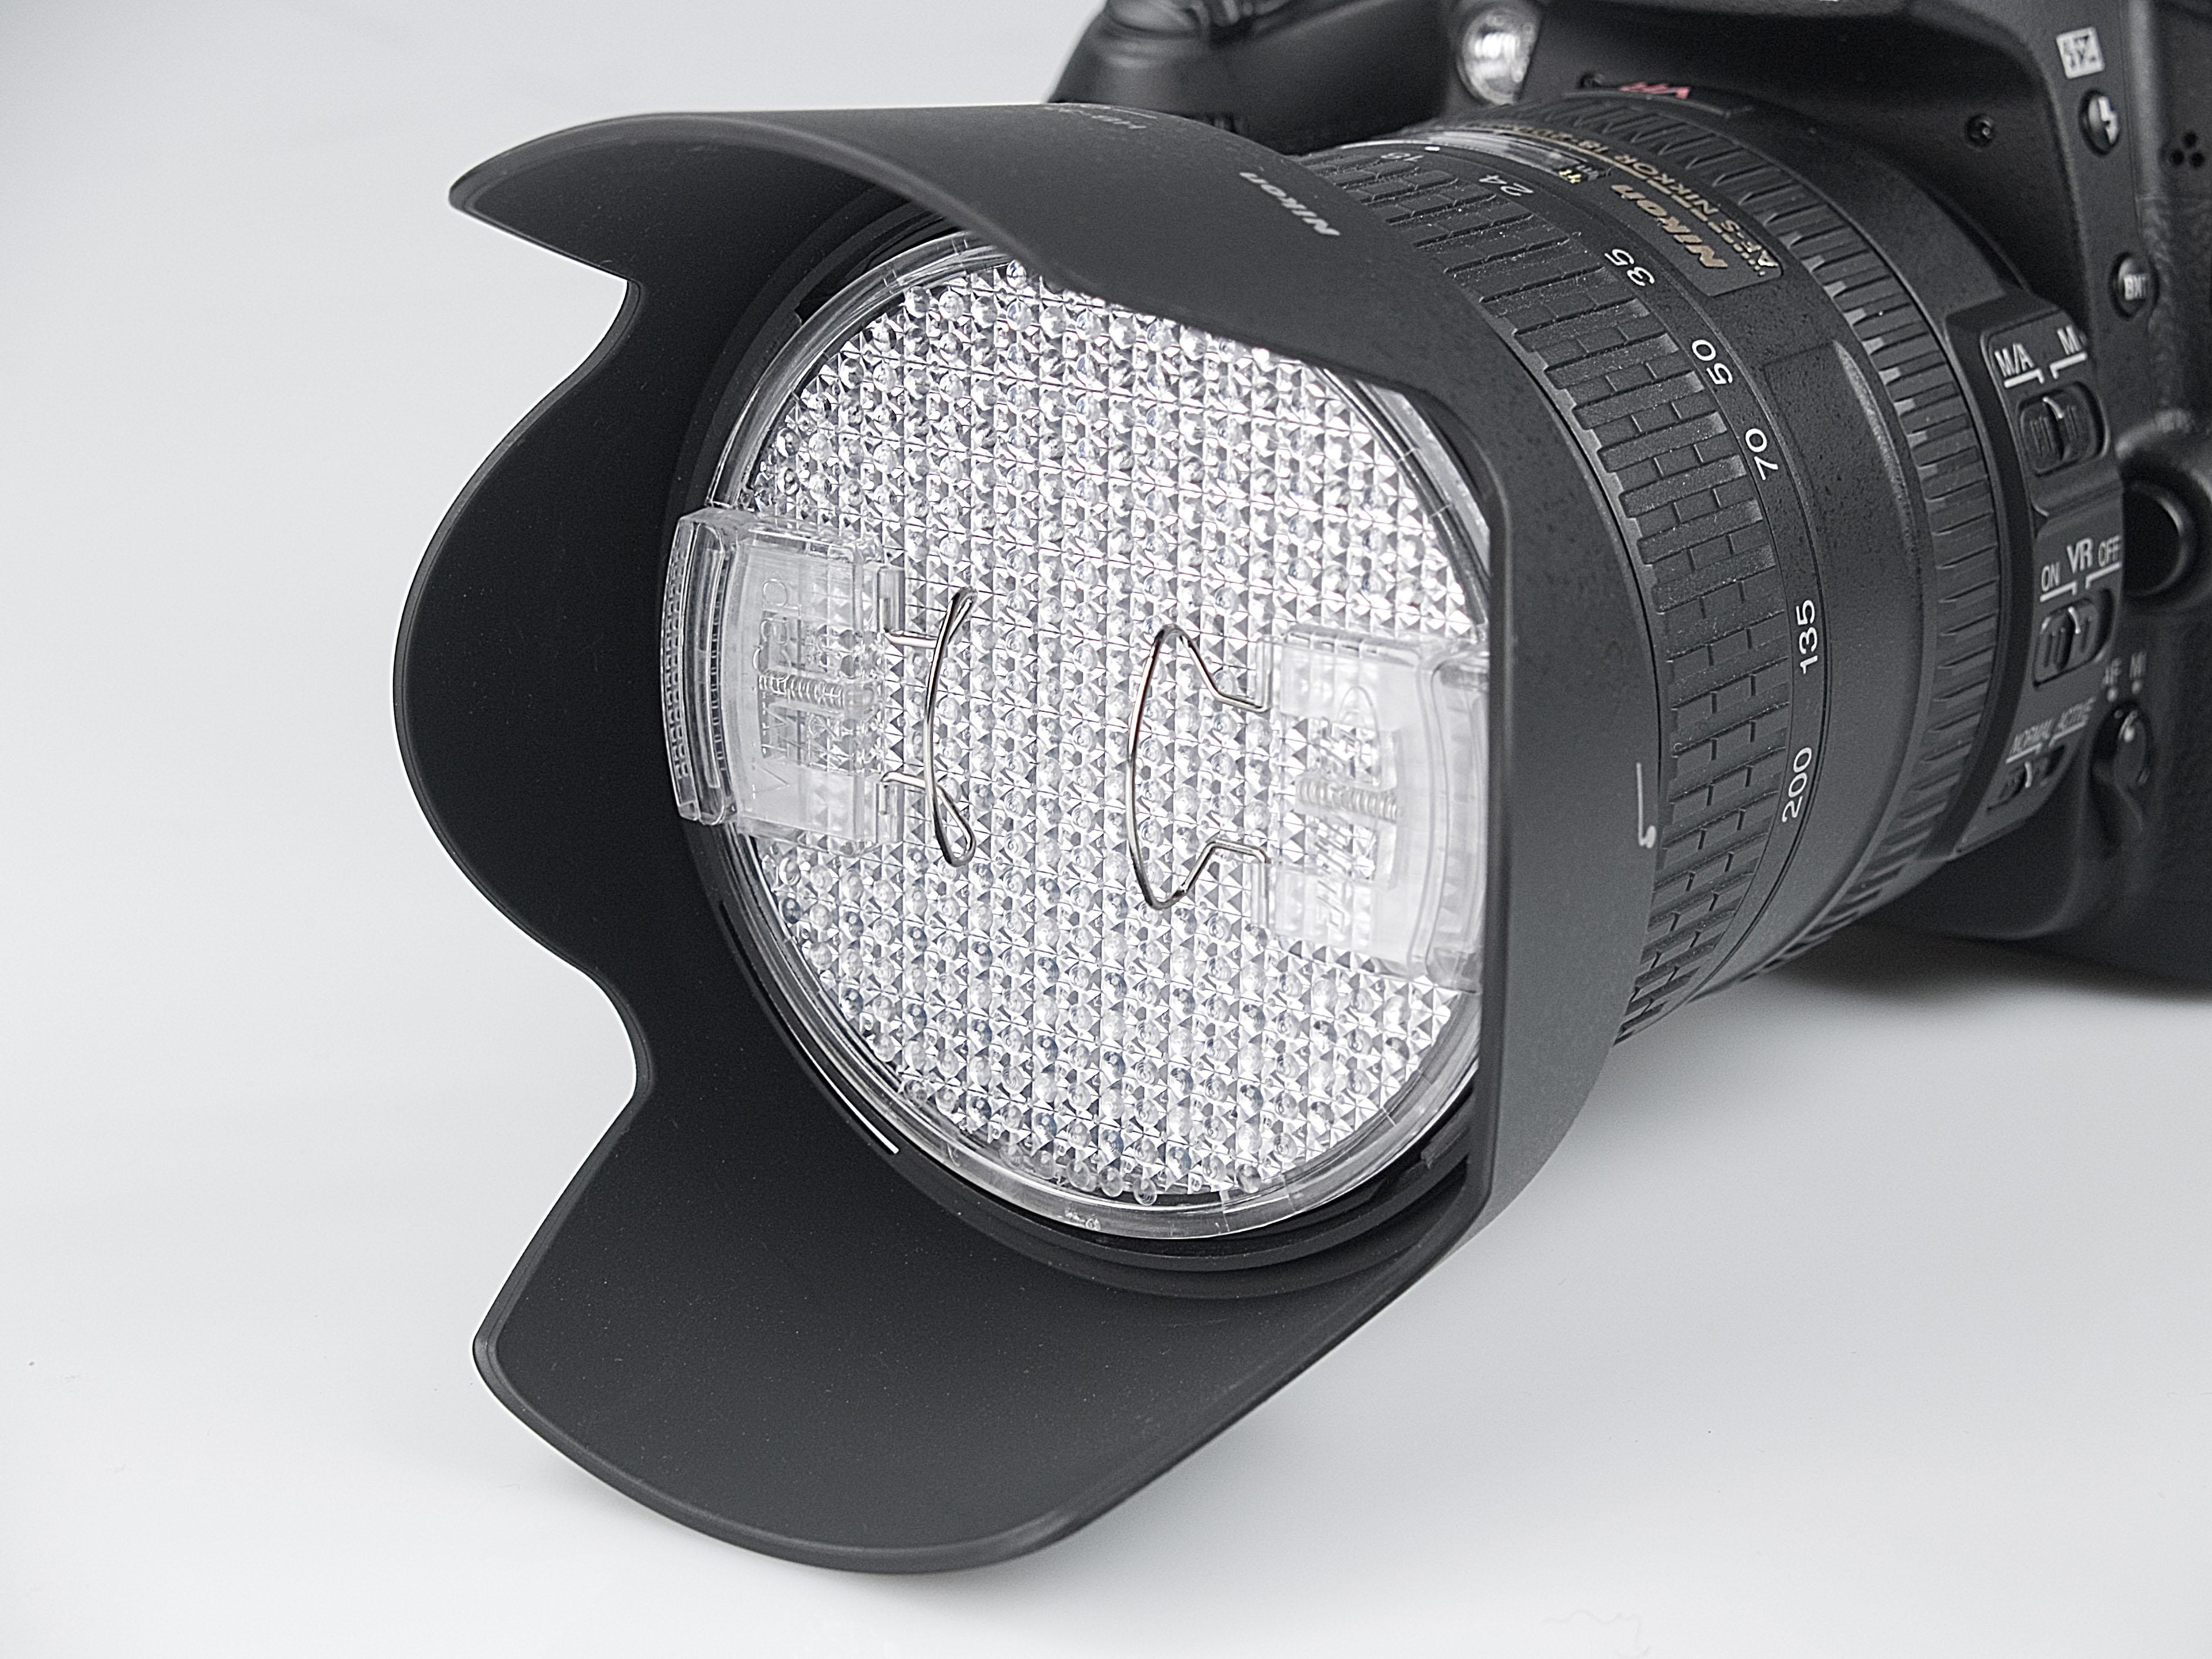 KAISER Weißabgleich-Filter Vivicap ø 55 mm